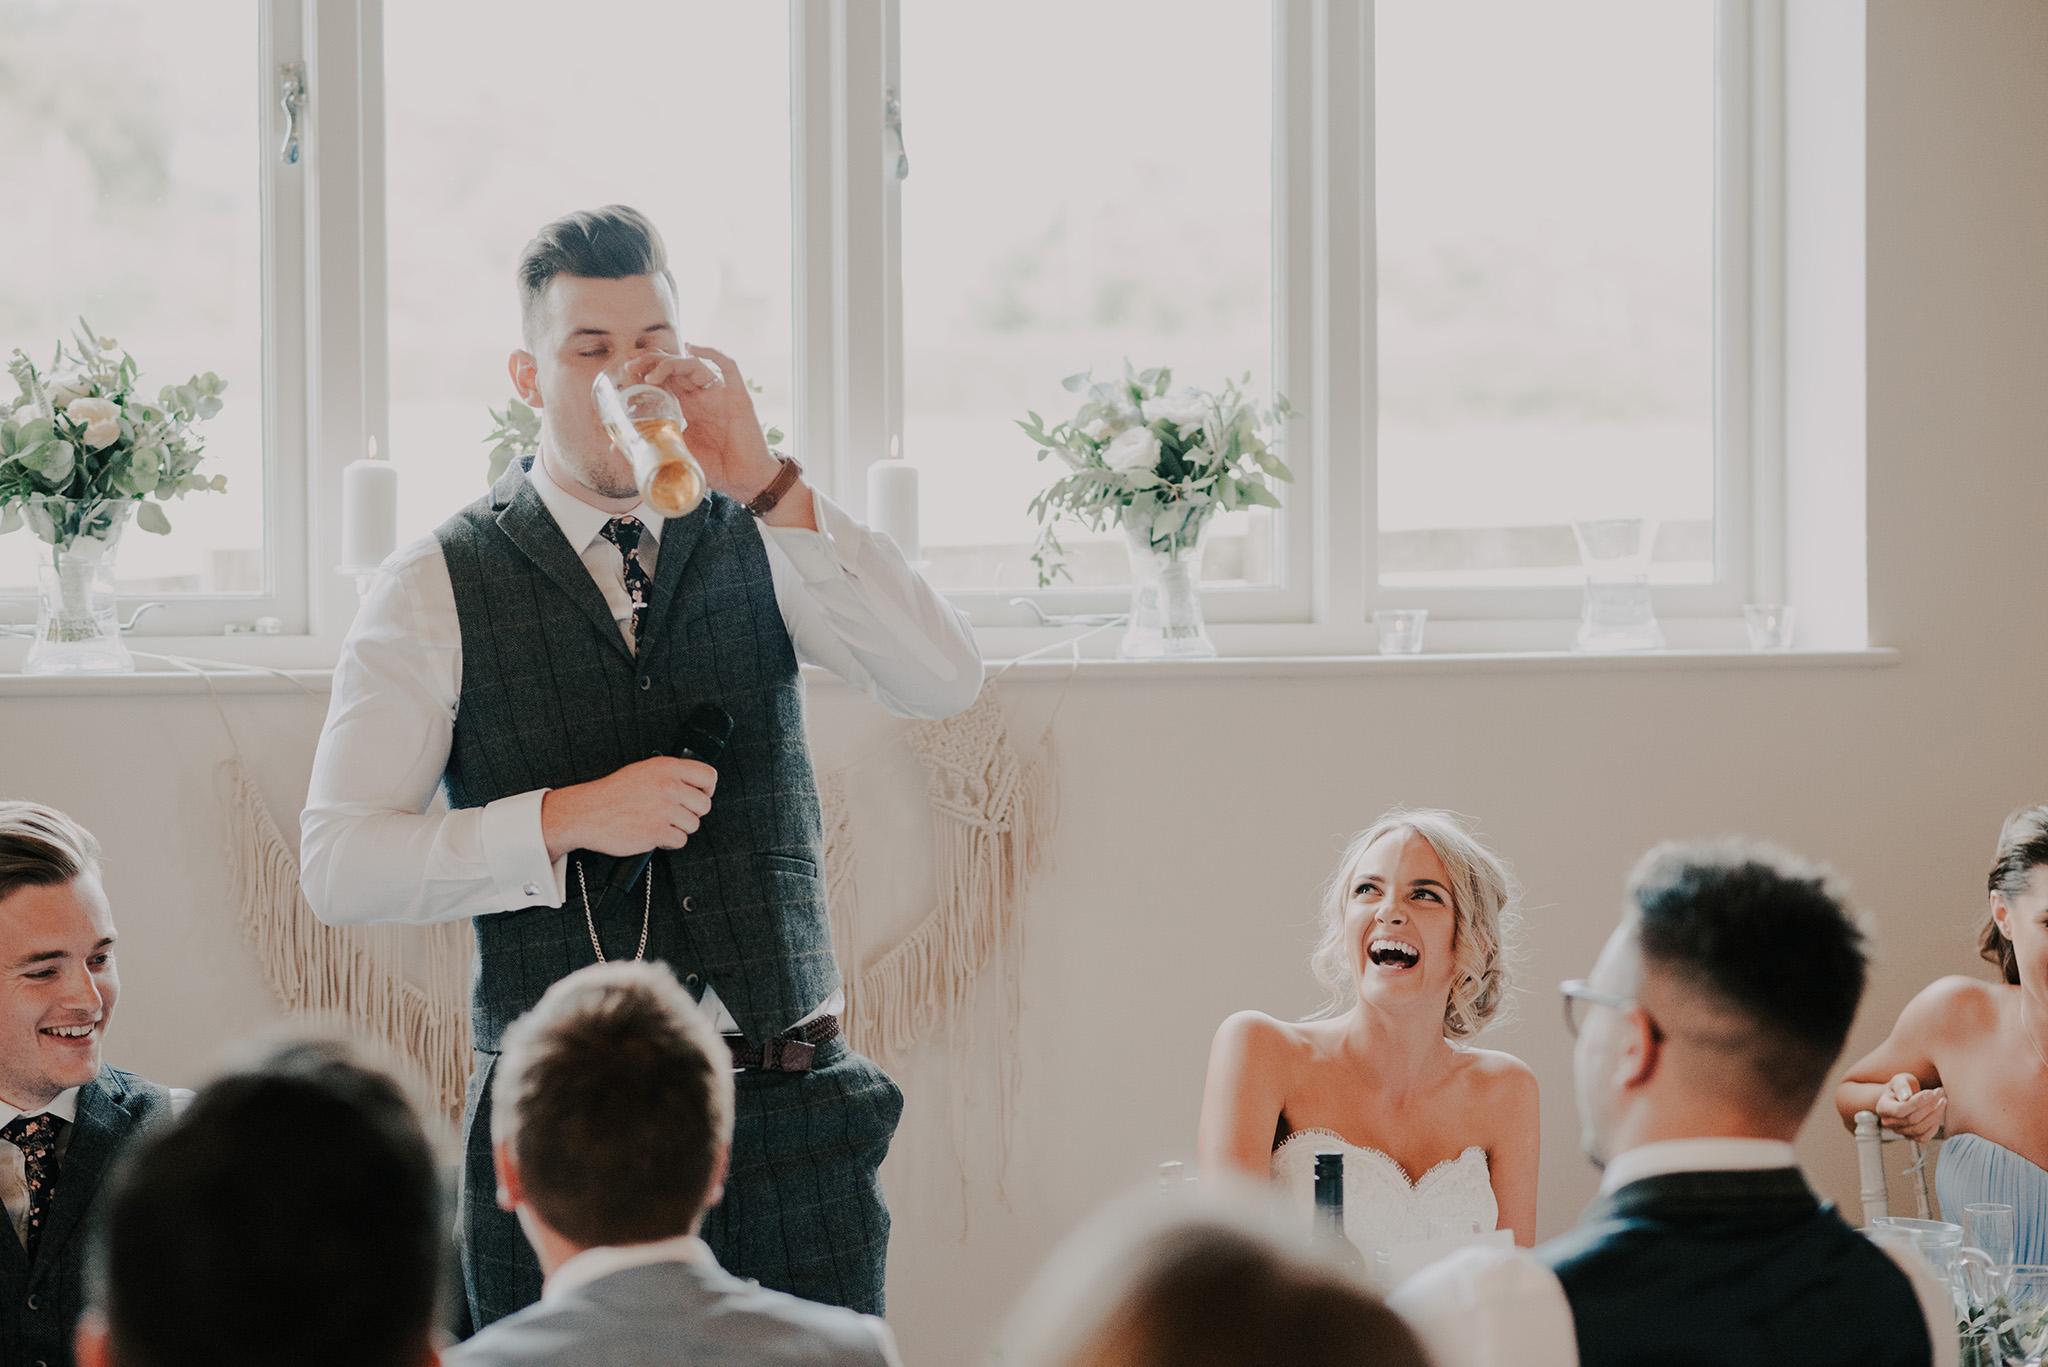 scott-stockwell-photography-wedding-49.jpg